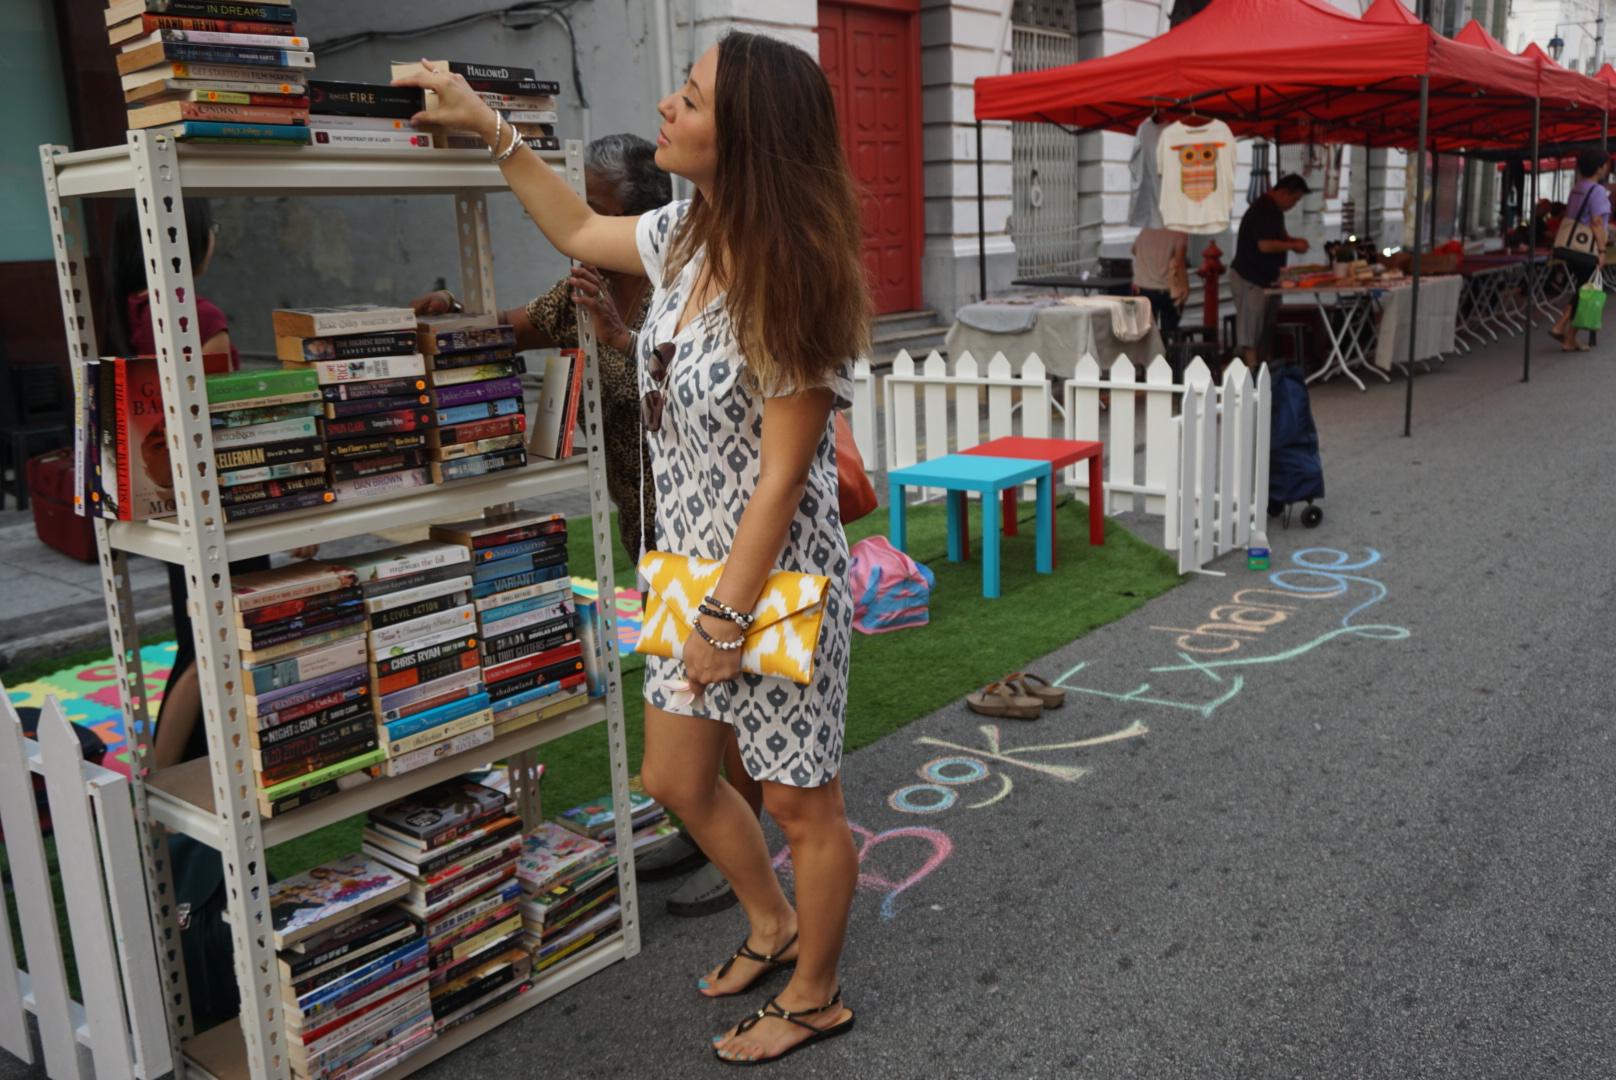 Even bookworms appreciate a vibrant  Lannie clutch  &  Juliet dresses  ;-)